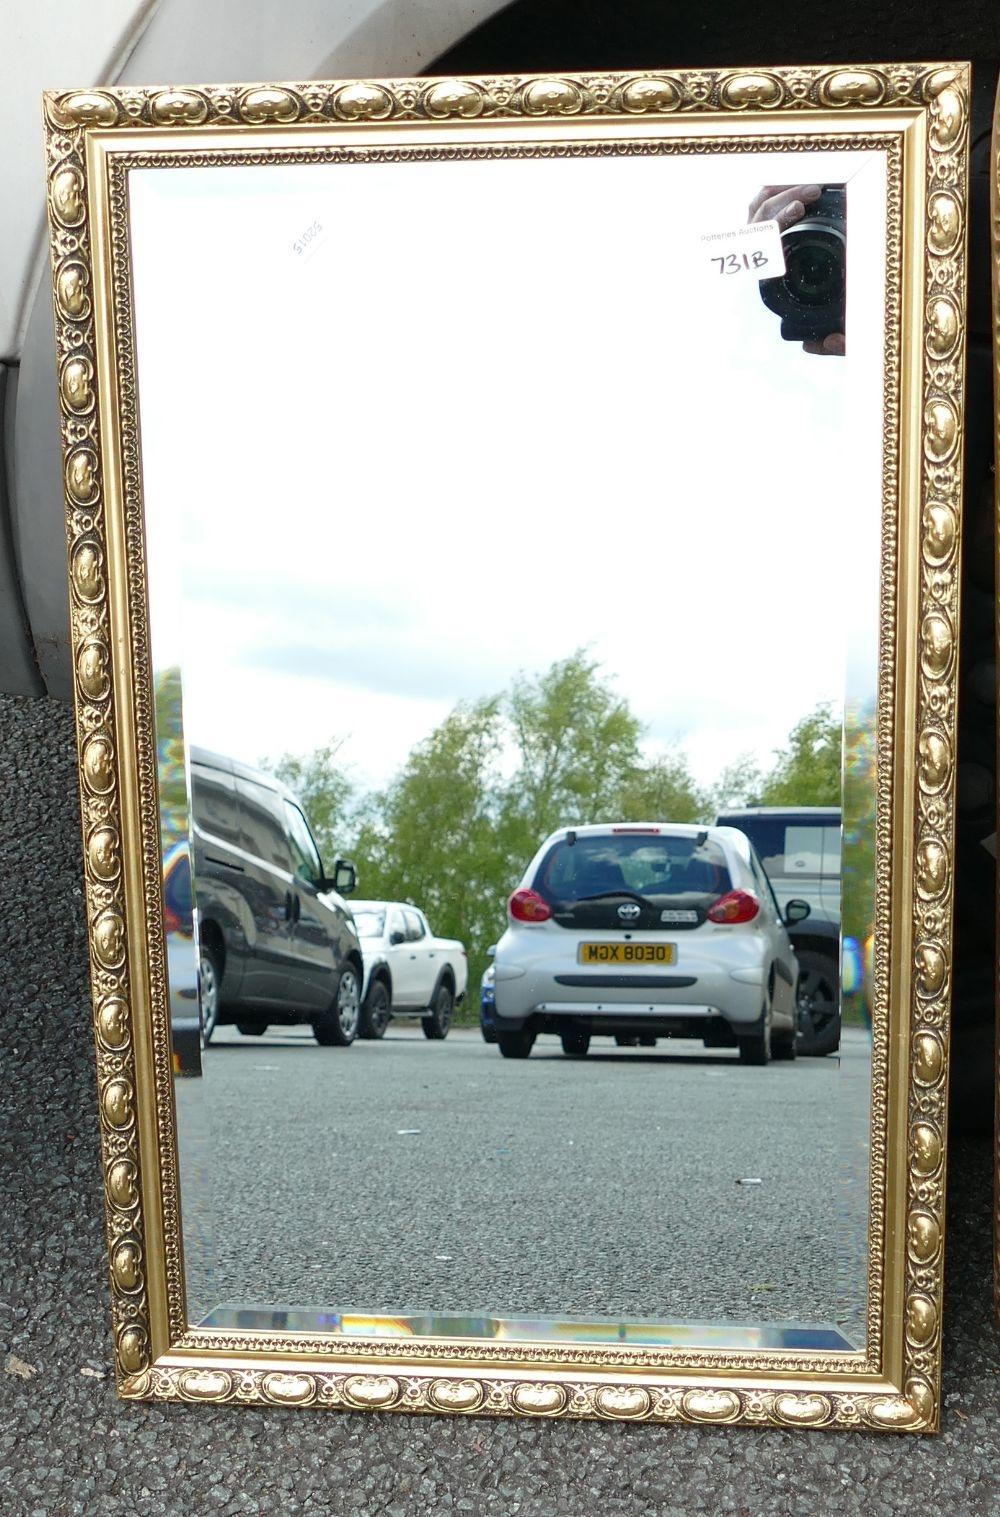 Gilt Effect Bevel Edged Wall mirror: height 67cm